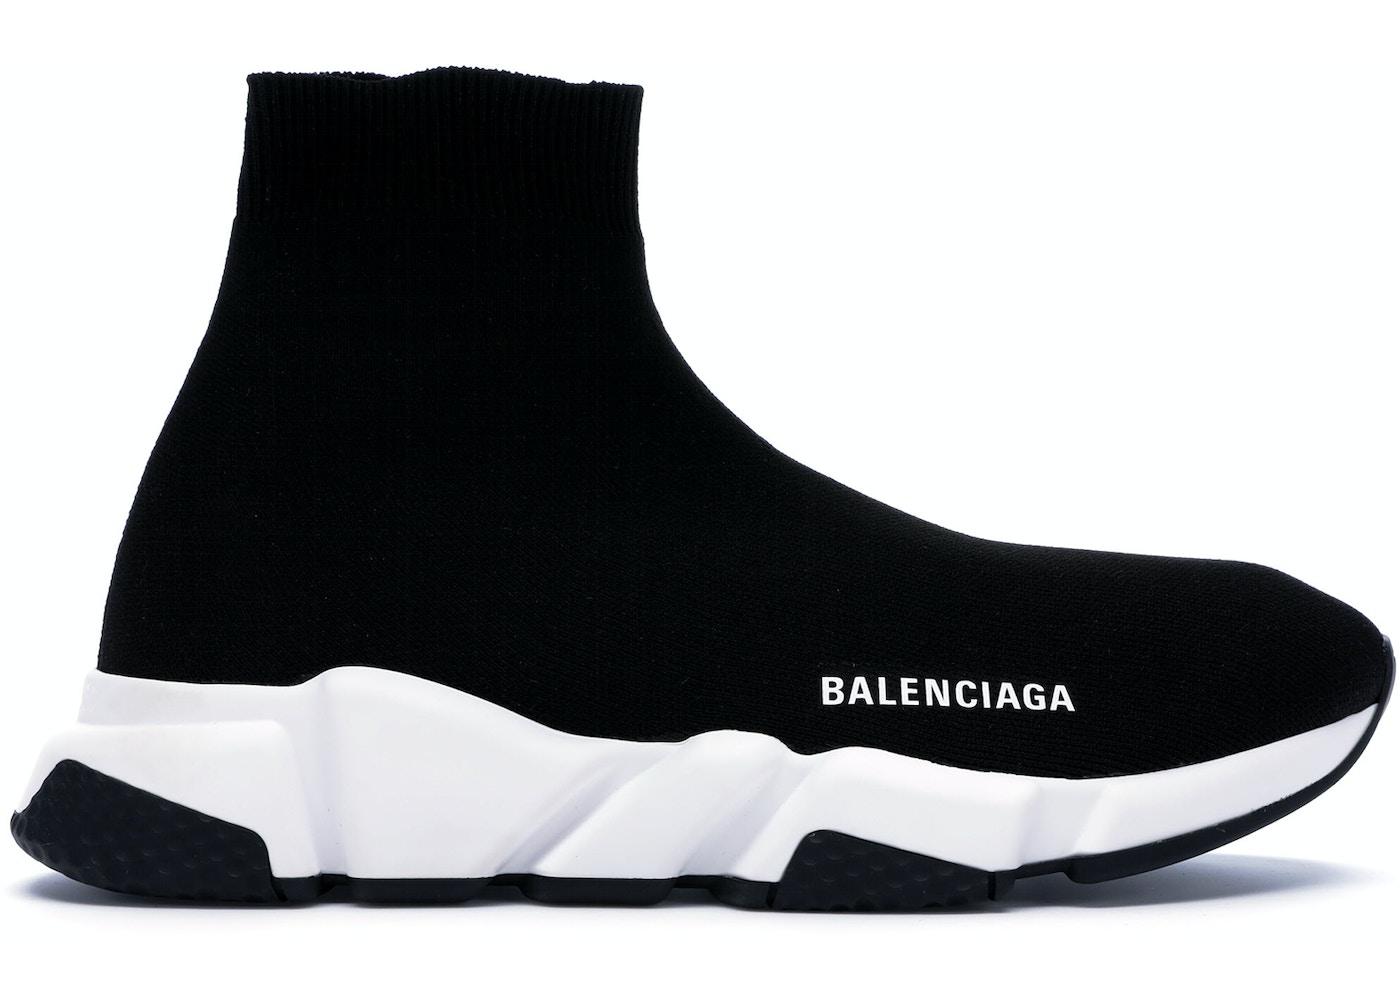 ca1a5c80efa4 Balenciaga Speed Trainer Black White (2018) - 530349 W05G9 1000